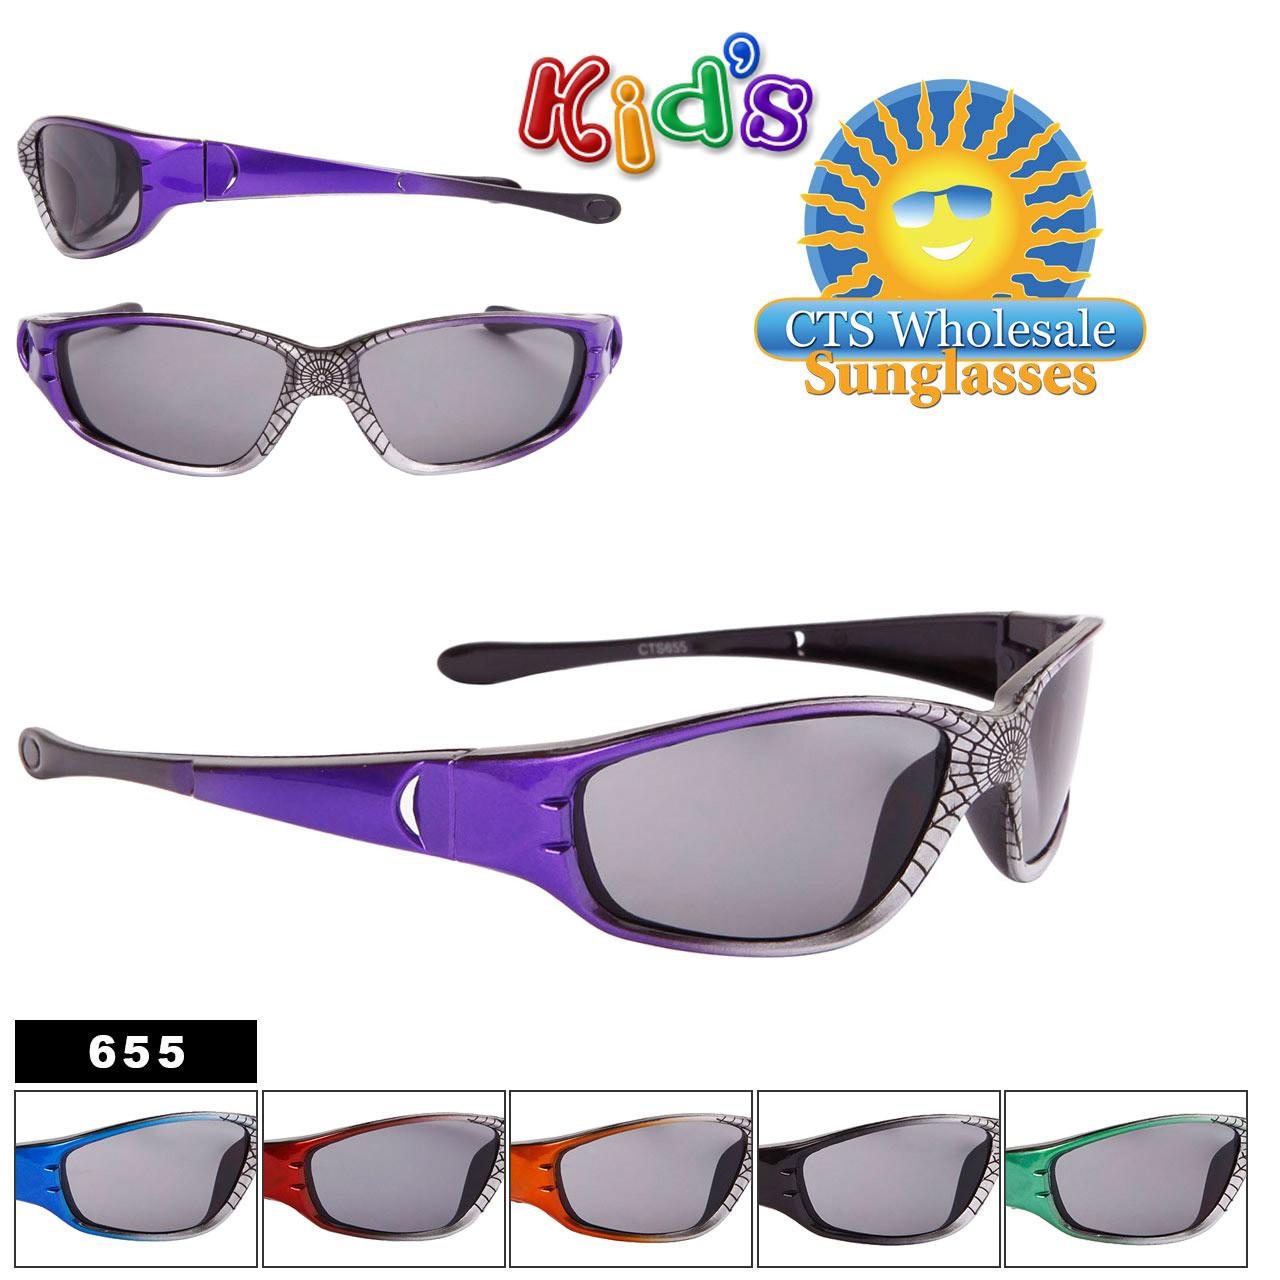 Sporty Kid's Sunglasses Wholesale - Style #655